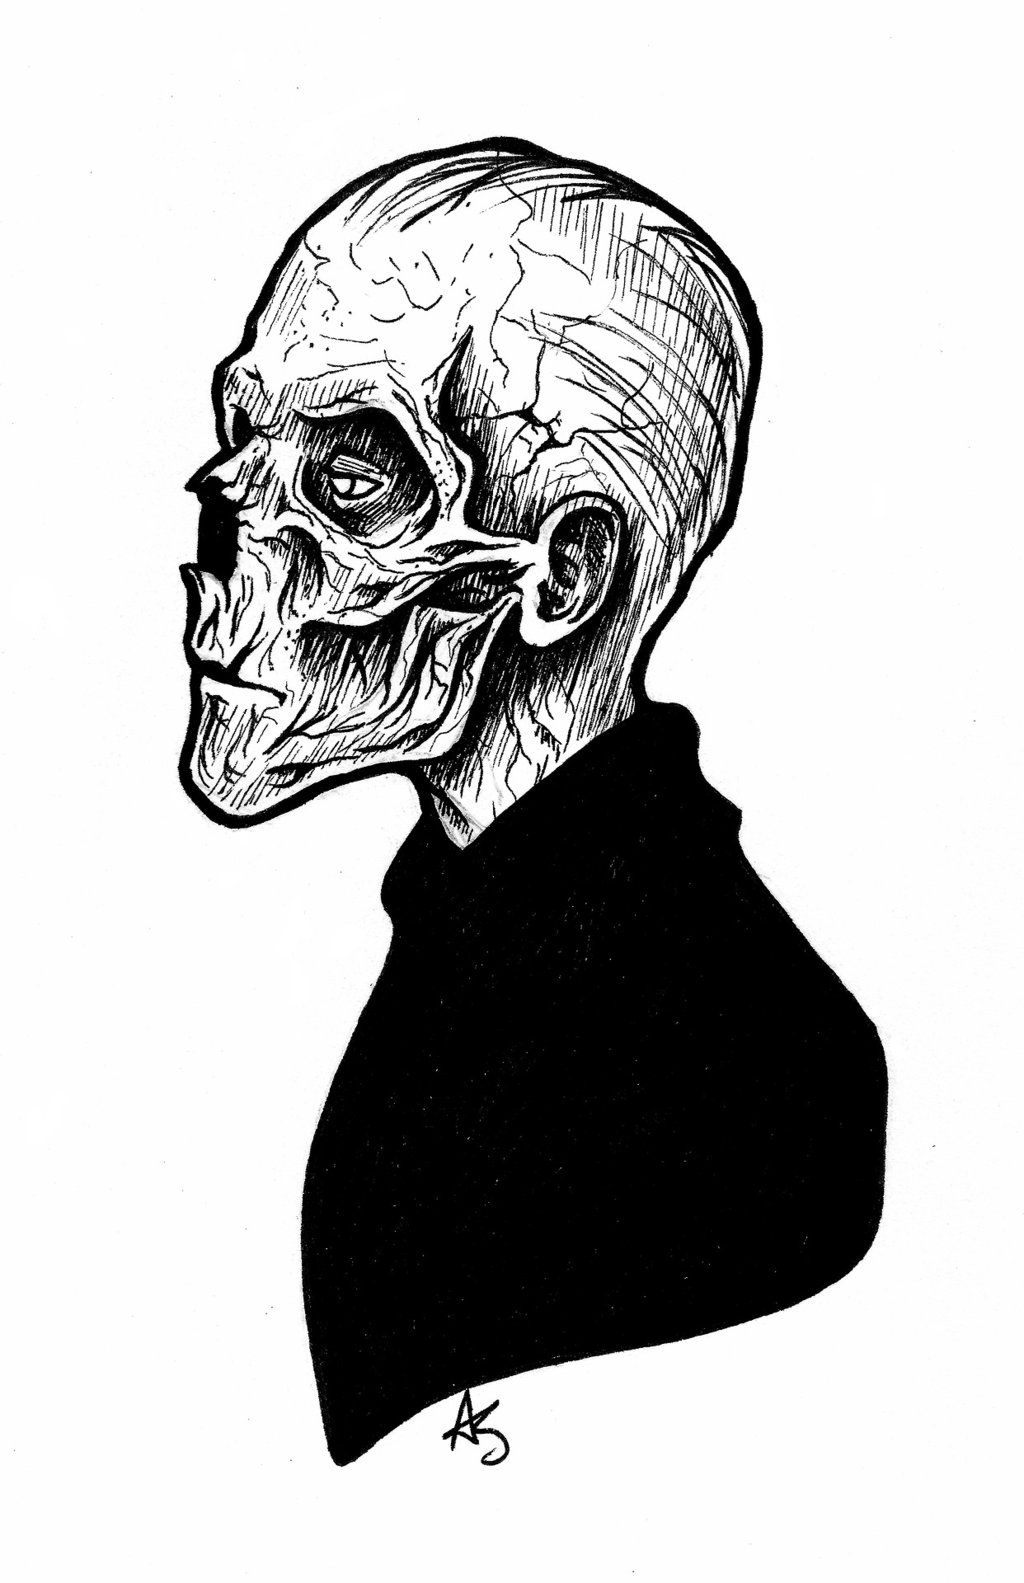 Death's Head by bananaboo2.deviantart.com on @DeviantArt